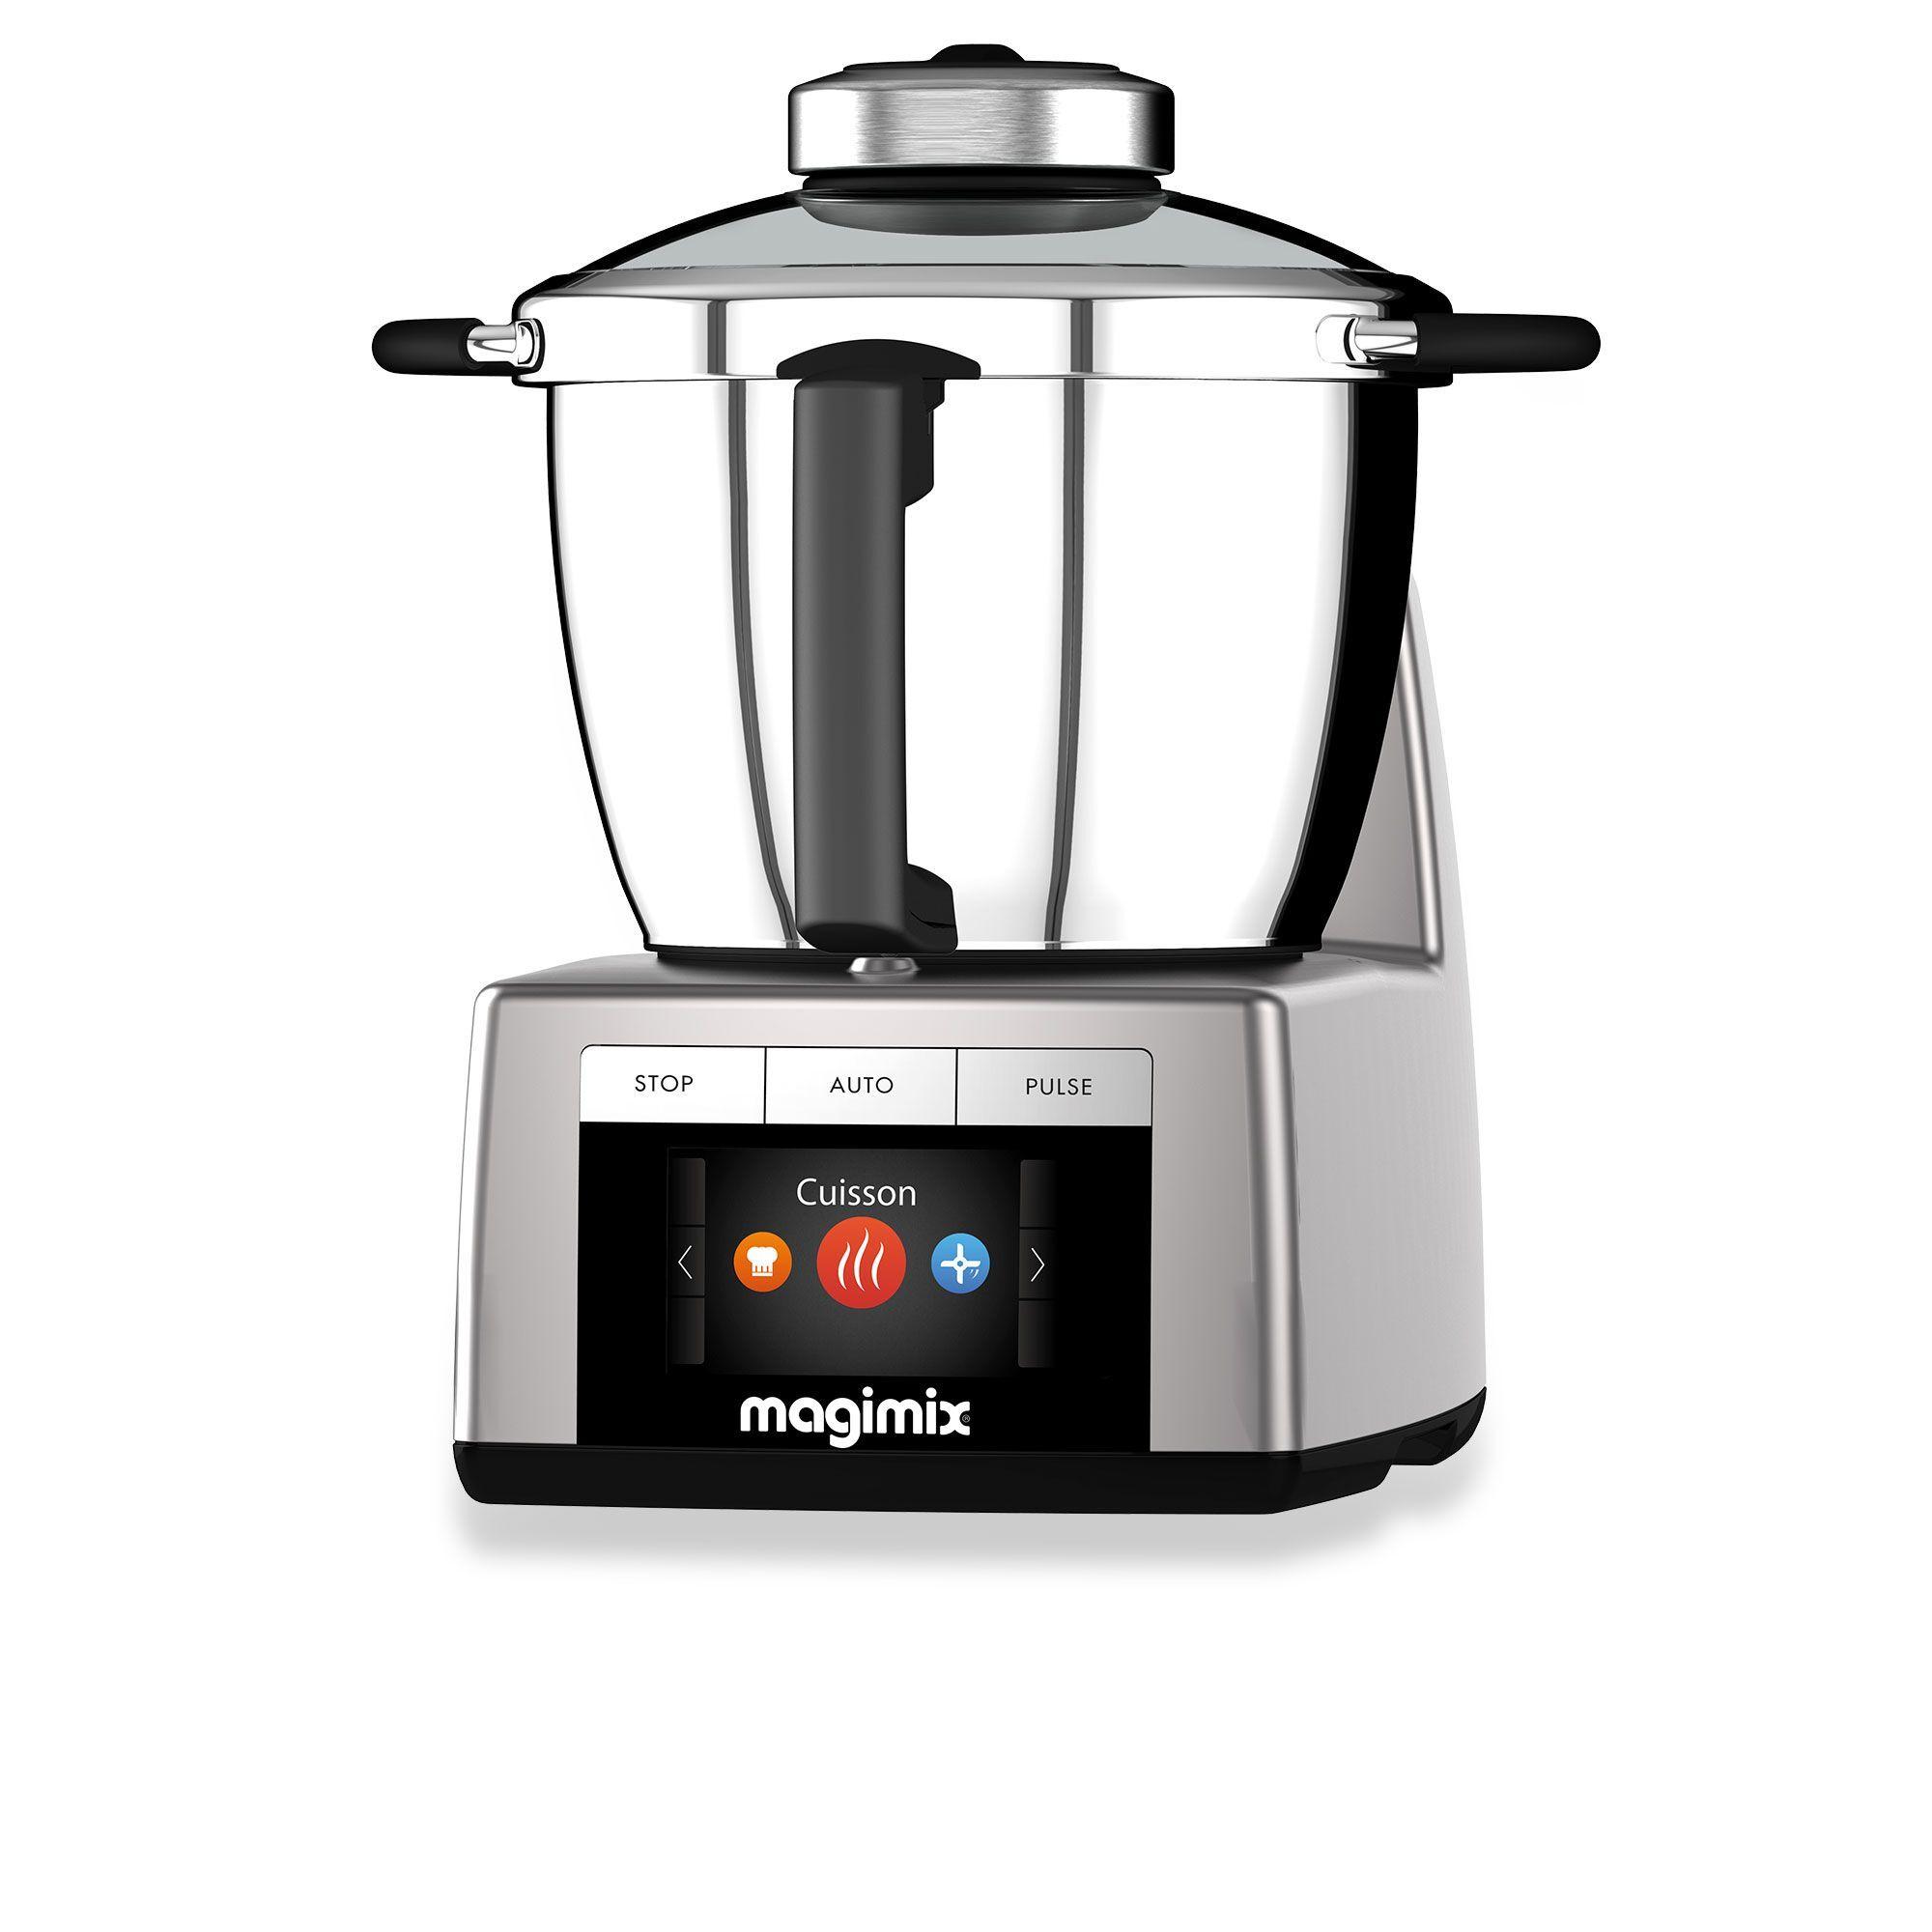 magimix cook expert robot da cucina multifunzione + vaporiera xxl